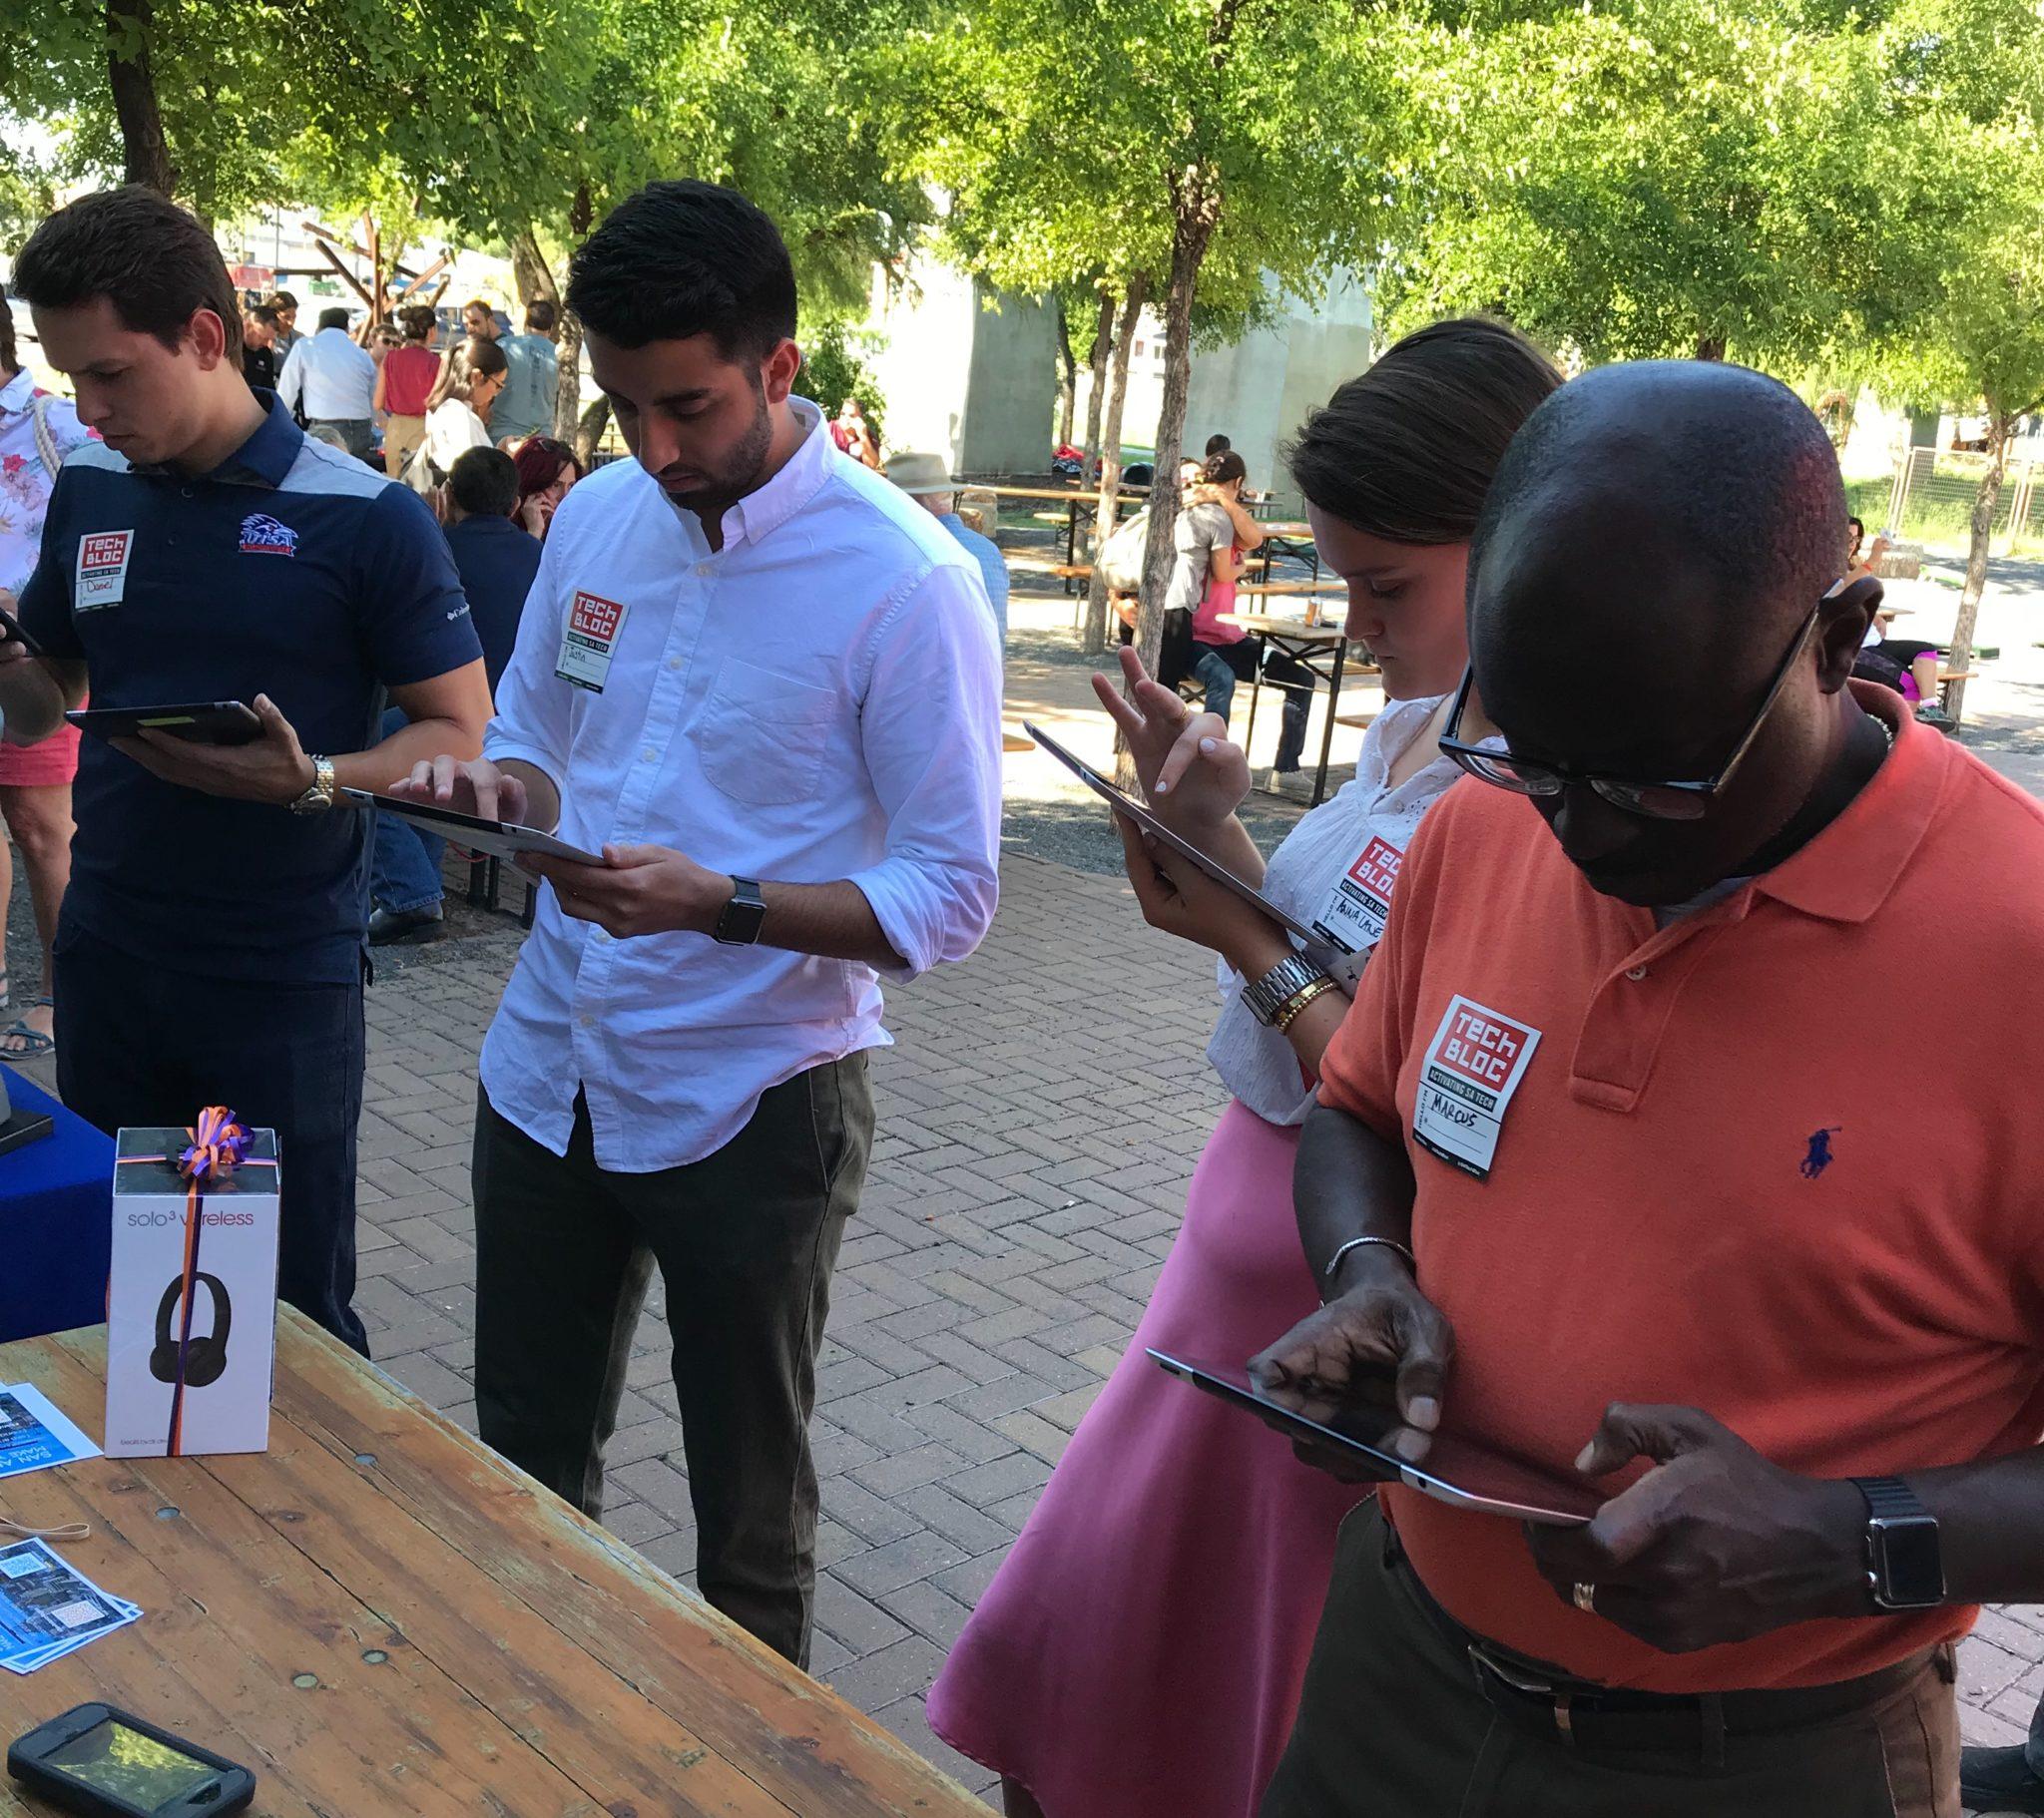 Tech Bloc event attendees take the San Antonio Regional Economic Development Strategy survey during a meetup.